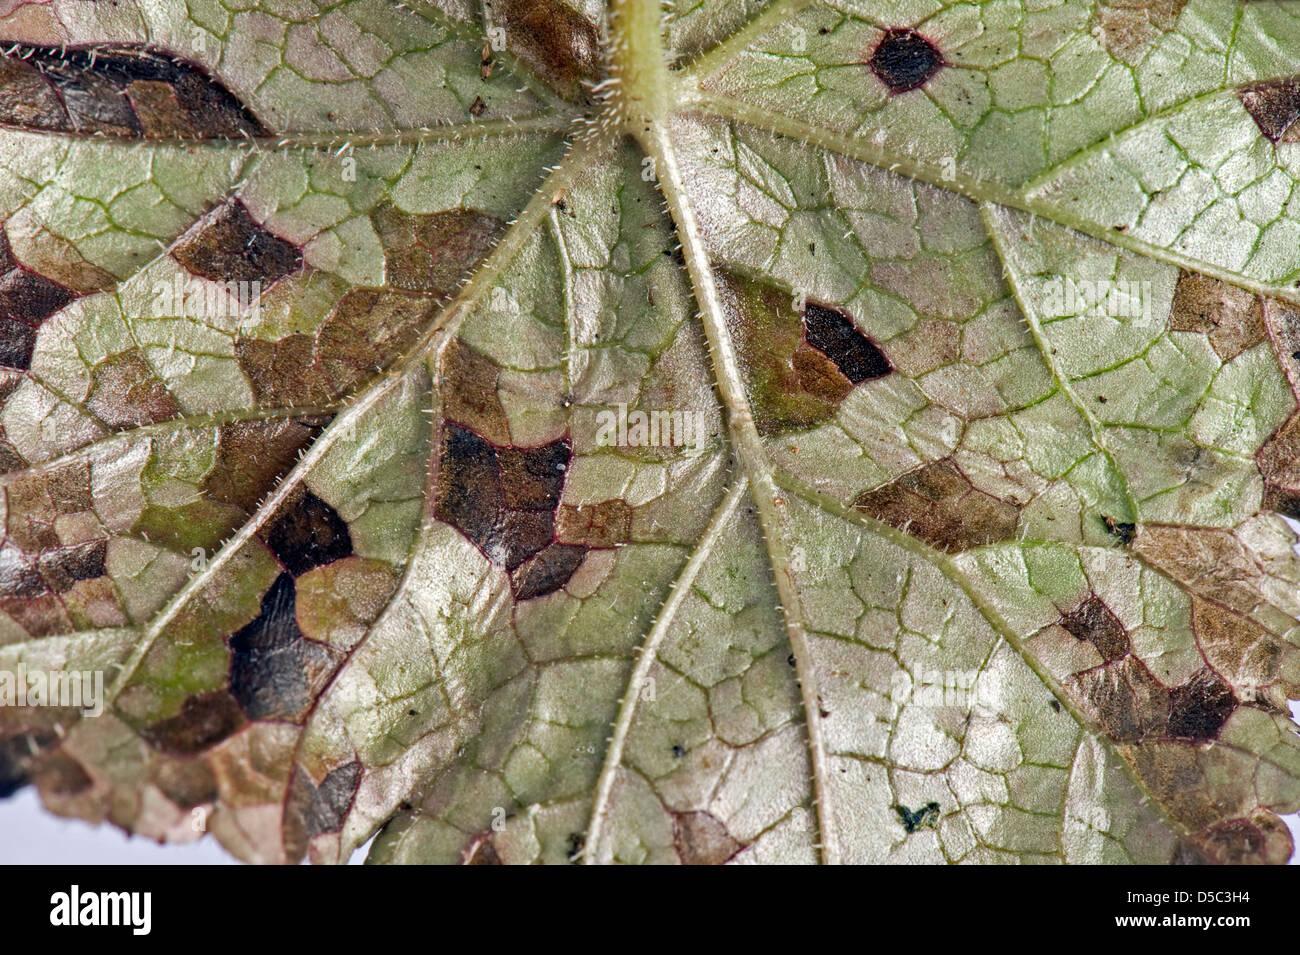 Foliar nematode, Aphelenchoides spp, angular leaf spotting on an ornamental anemone plant leaf underside - Stock Image